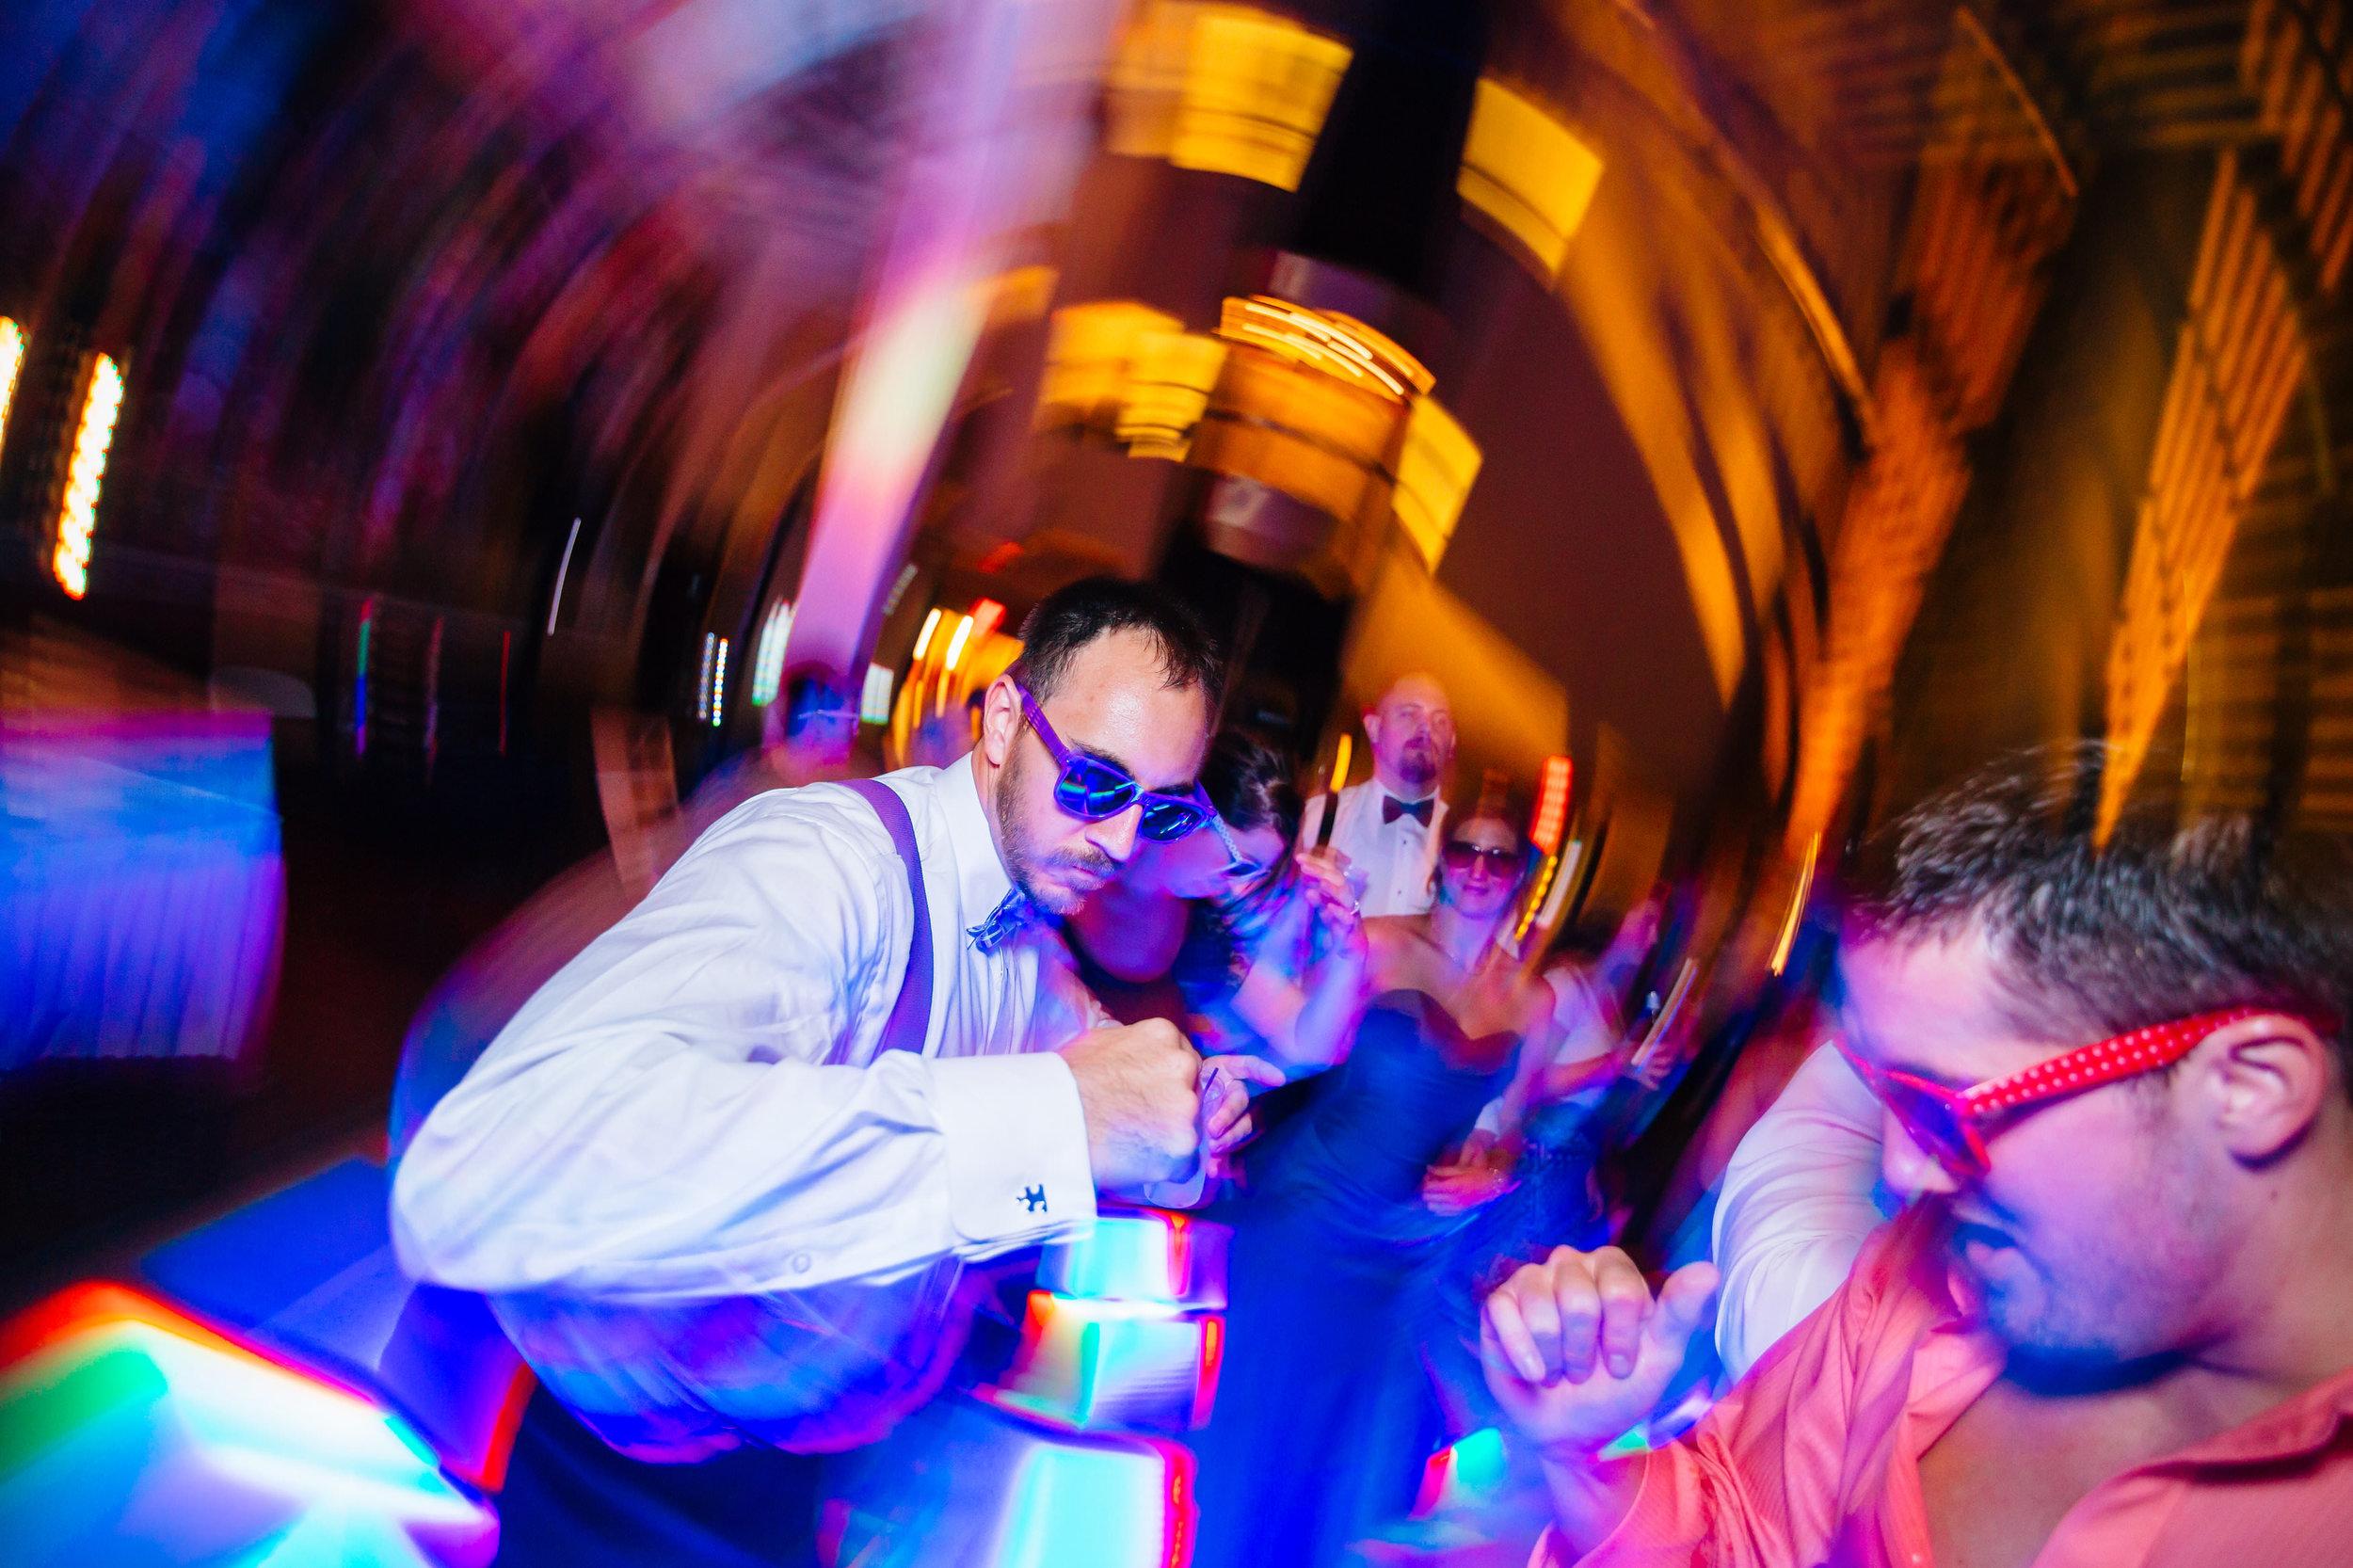 Groom_dance_at_reception.jpg